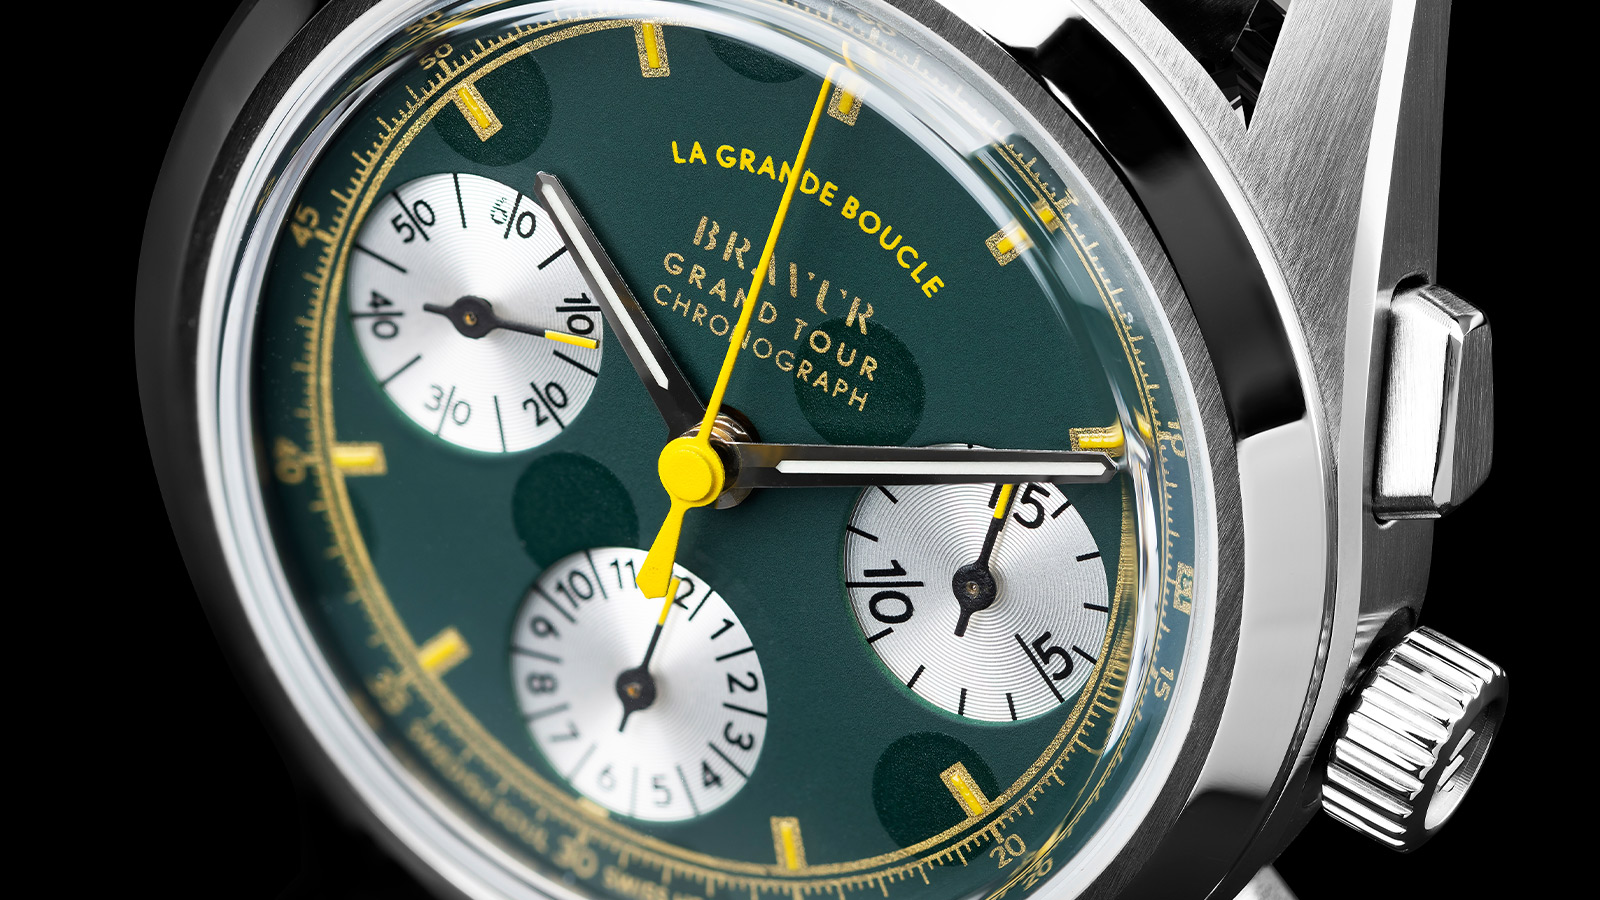 Bravur La Grande Boucle Chronograph